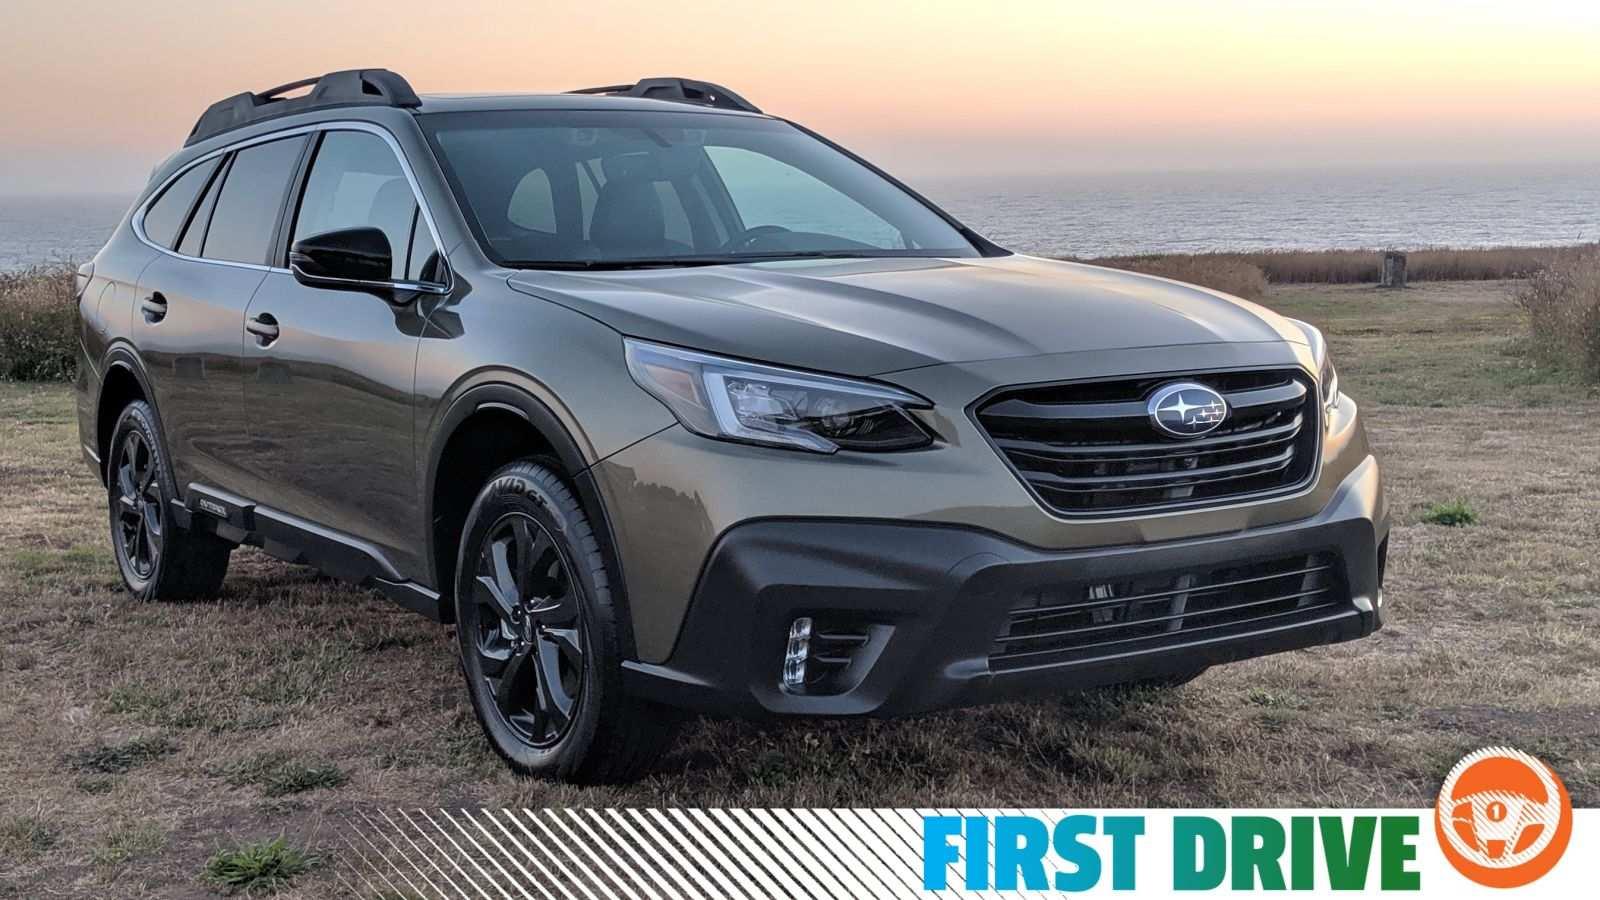 56 Great Subaru Outback 2020 Uk Speed Test with Subaru Outback 2020 Uk